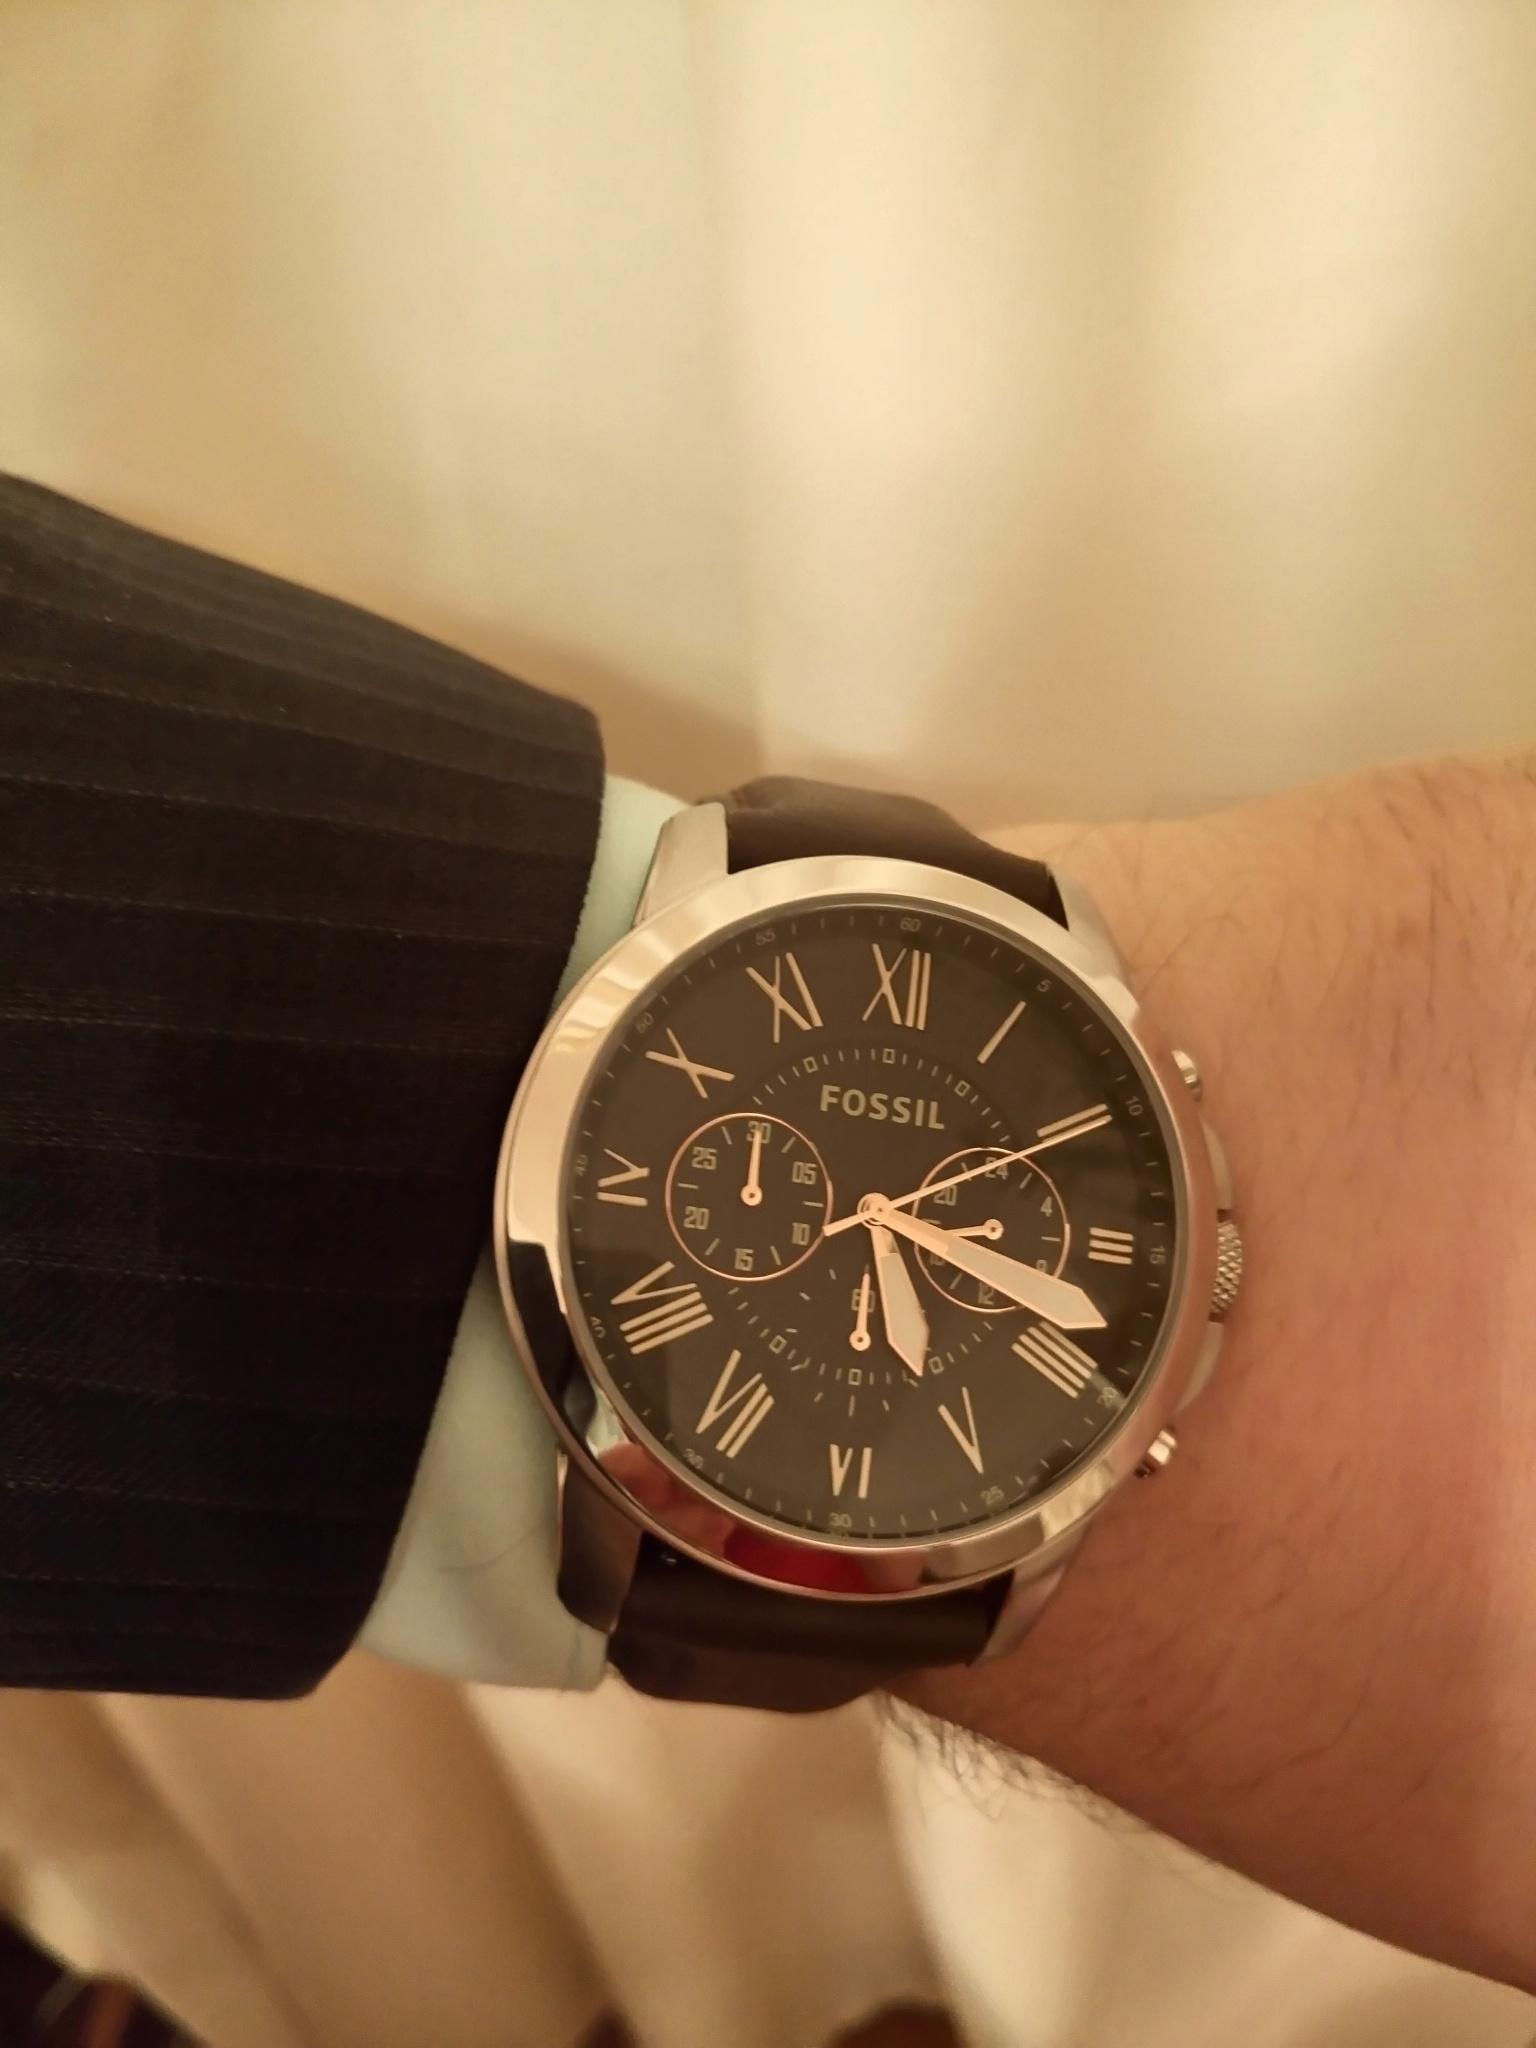 Наручные часы fossil fs4813 chronograph час купить дизель